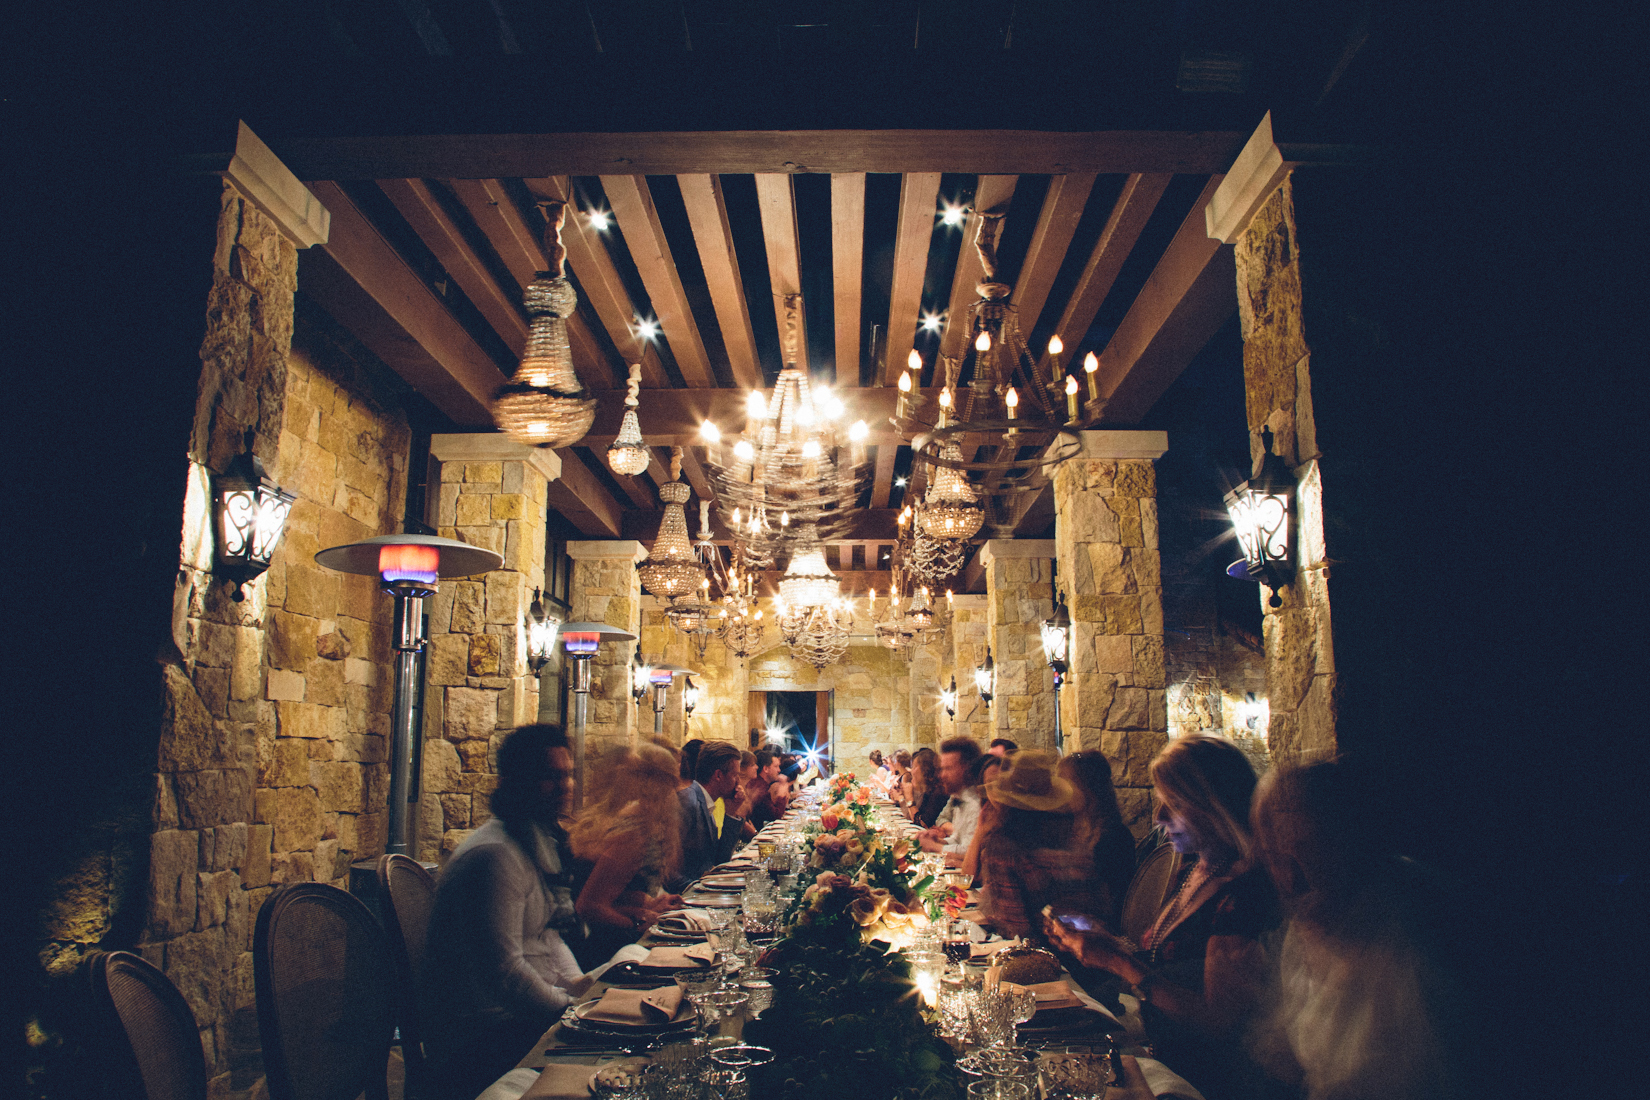 Casa de Perrin dinner by Paige Jones